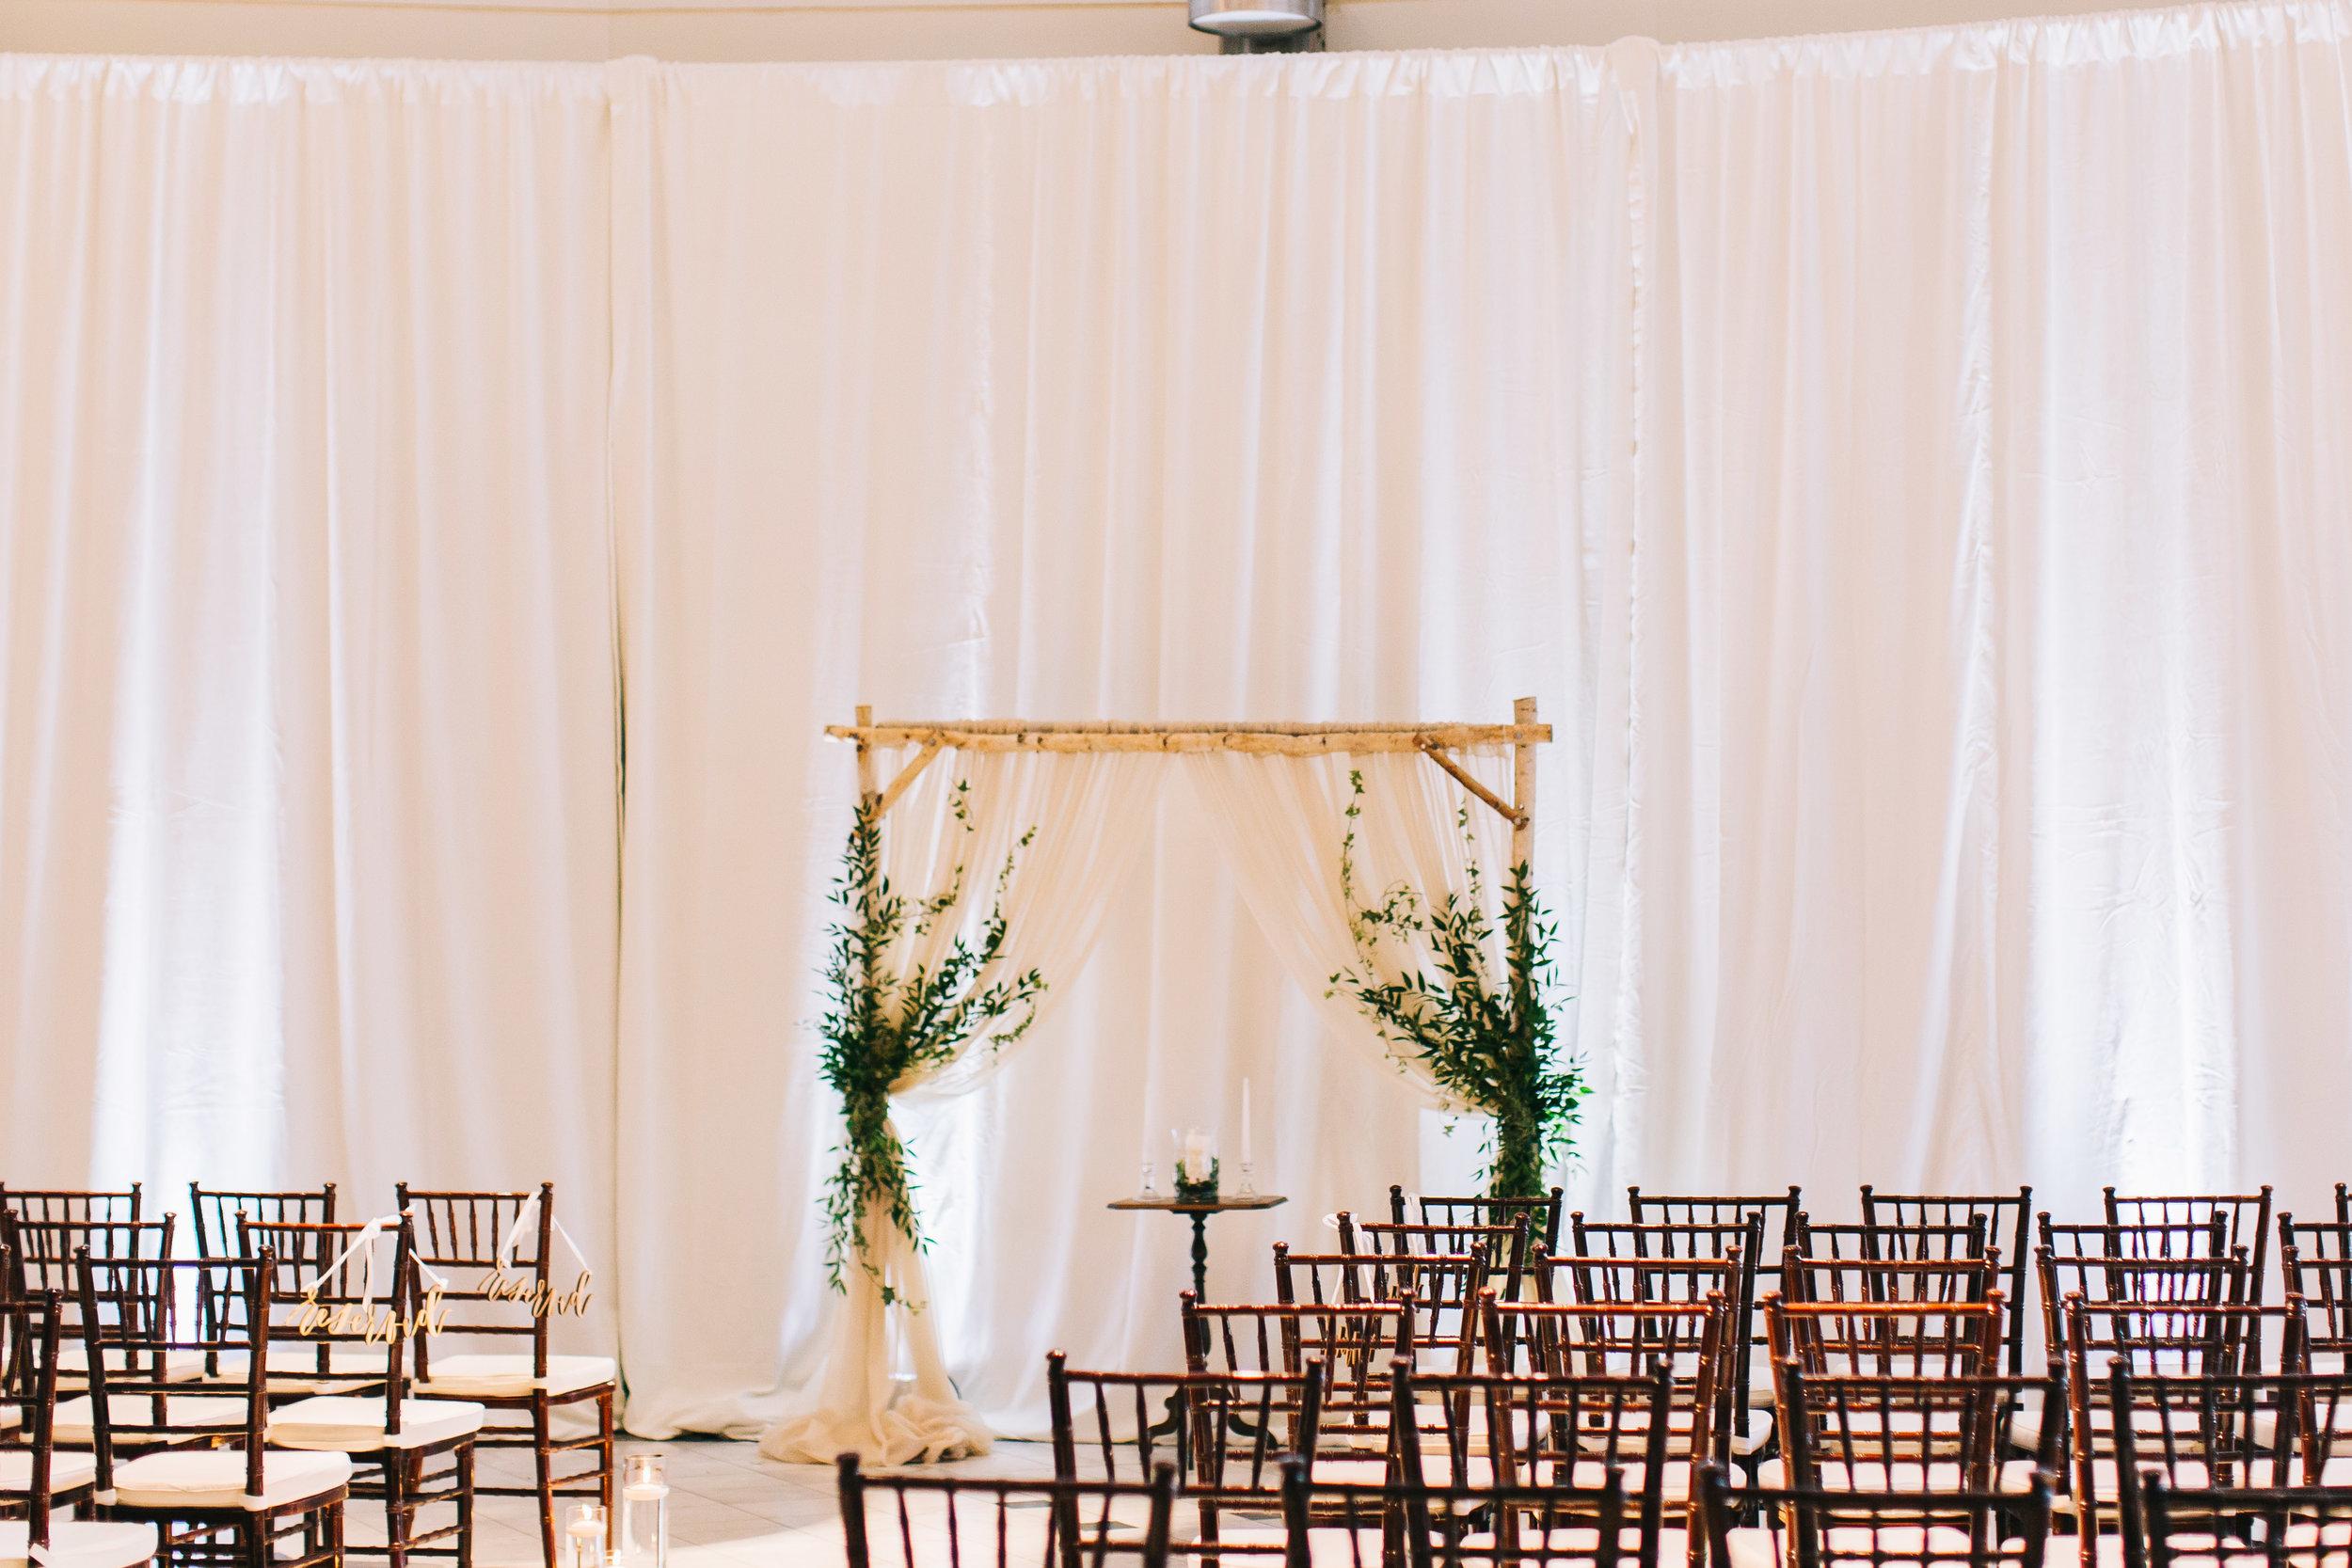 Bluegrass Chic - Ceremony Arch Greenery